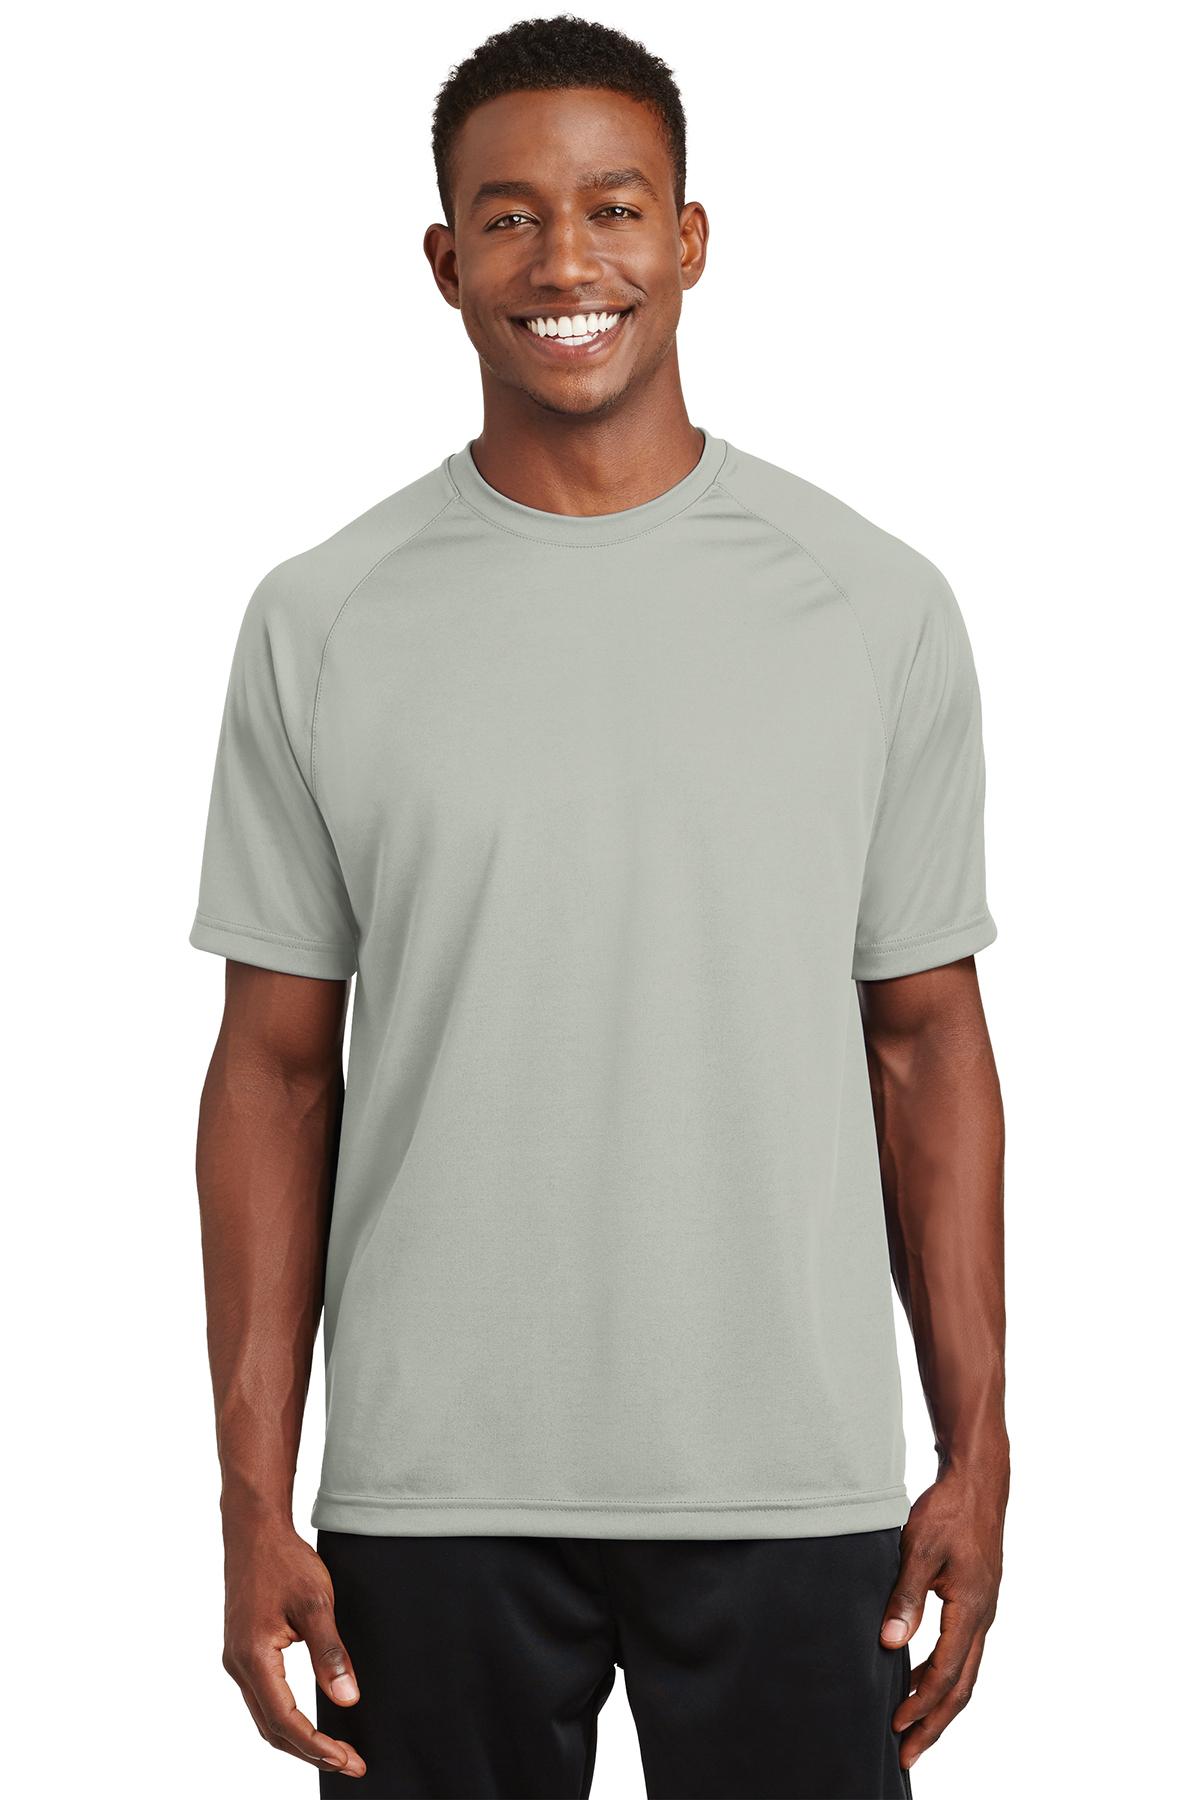 Sport Tek Dry Zone Short Sleeve Raglan T Shirt Performance T Shirts Sport Tek 16,000+ vectors, stock photos & psd files. sport tek dry zone short sleeve